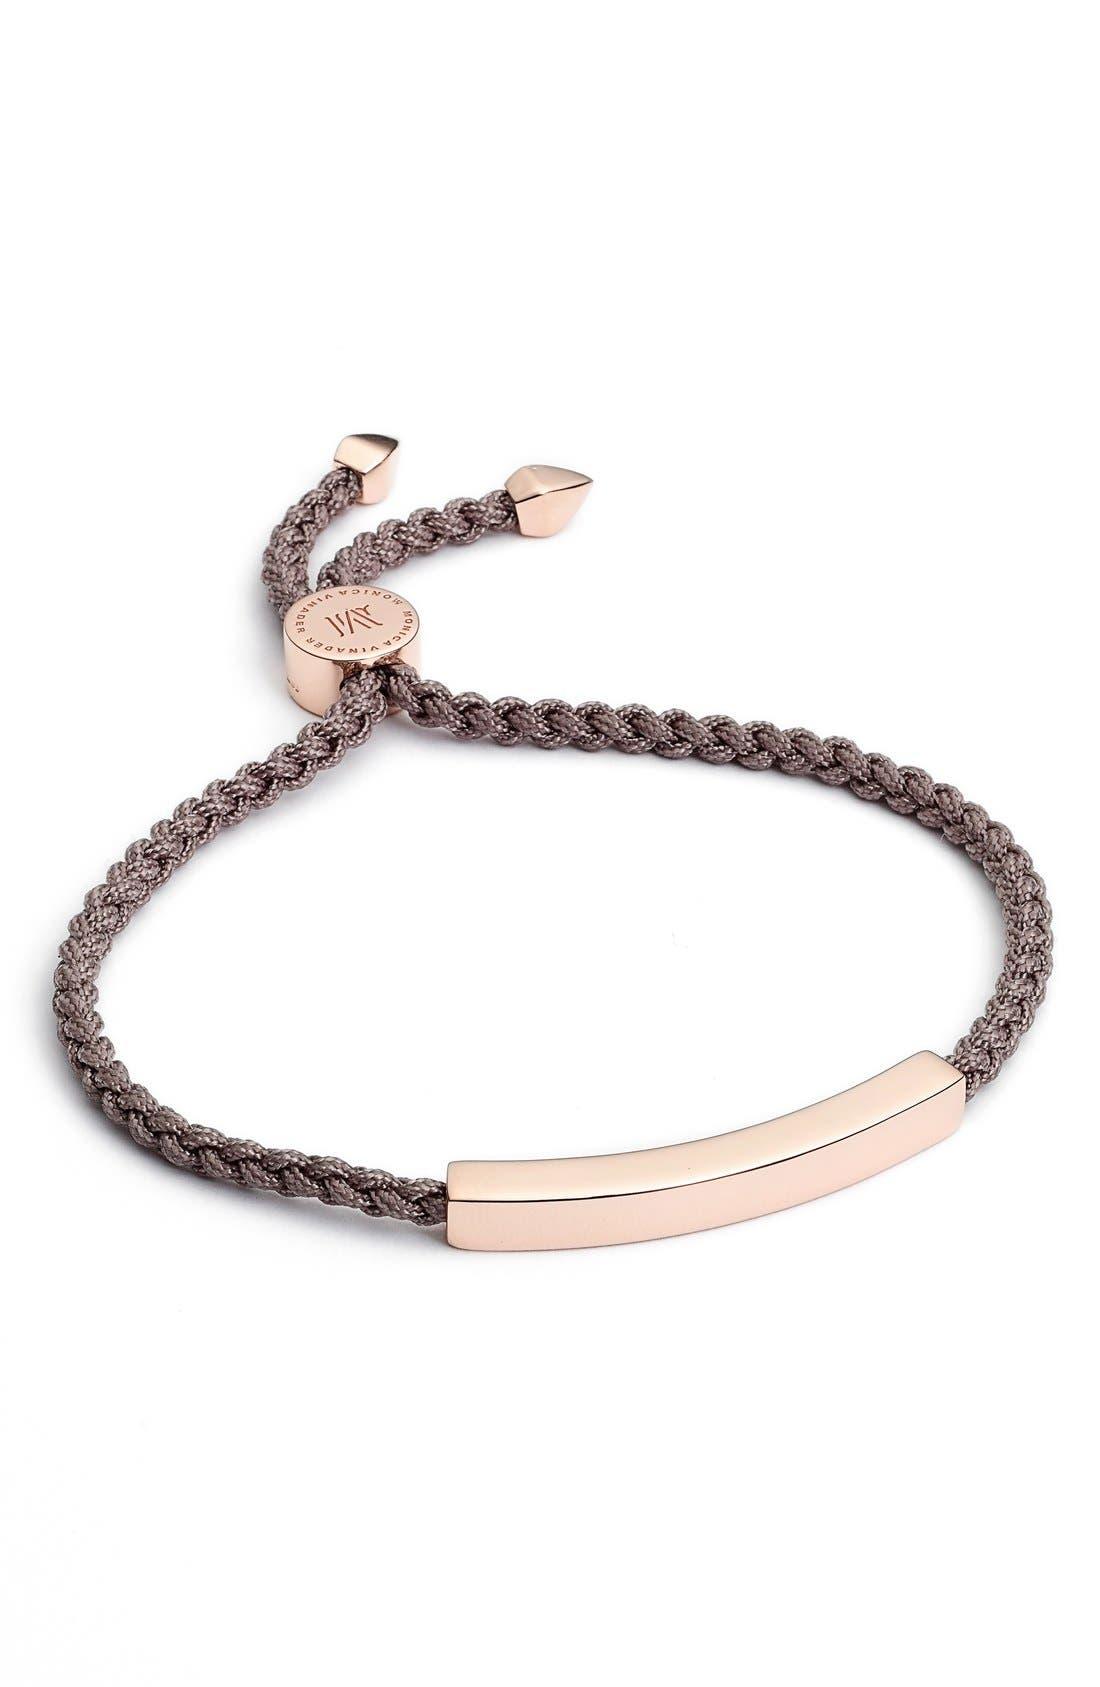 Alternate Image 1 Selected - Monica Vinader Linear Friendship Bracelet